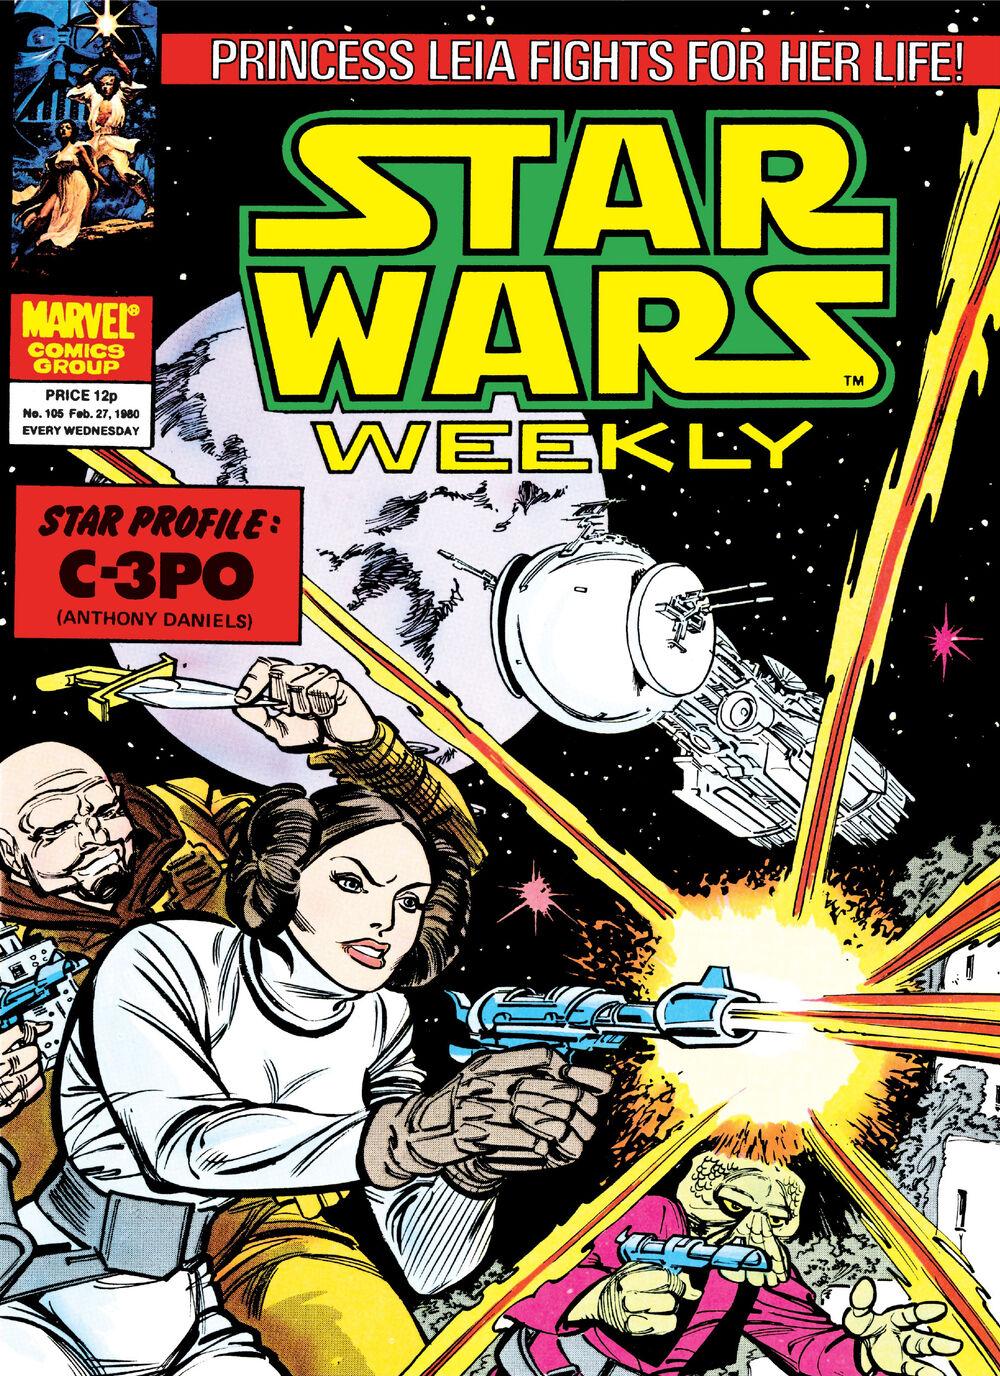 Star Wars Weekly 105